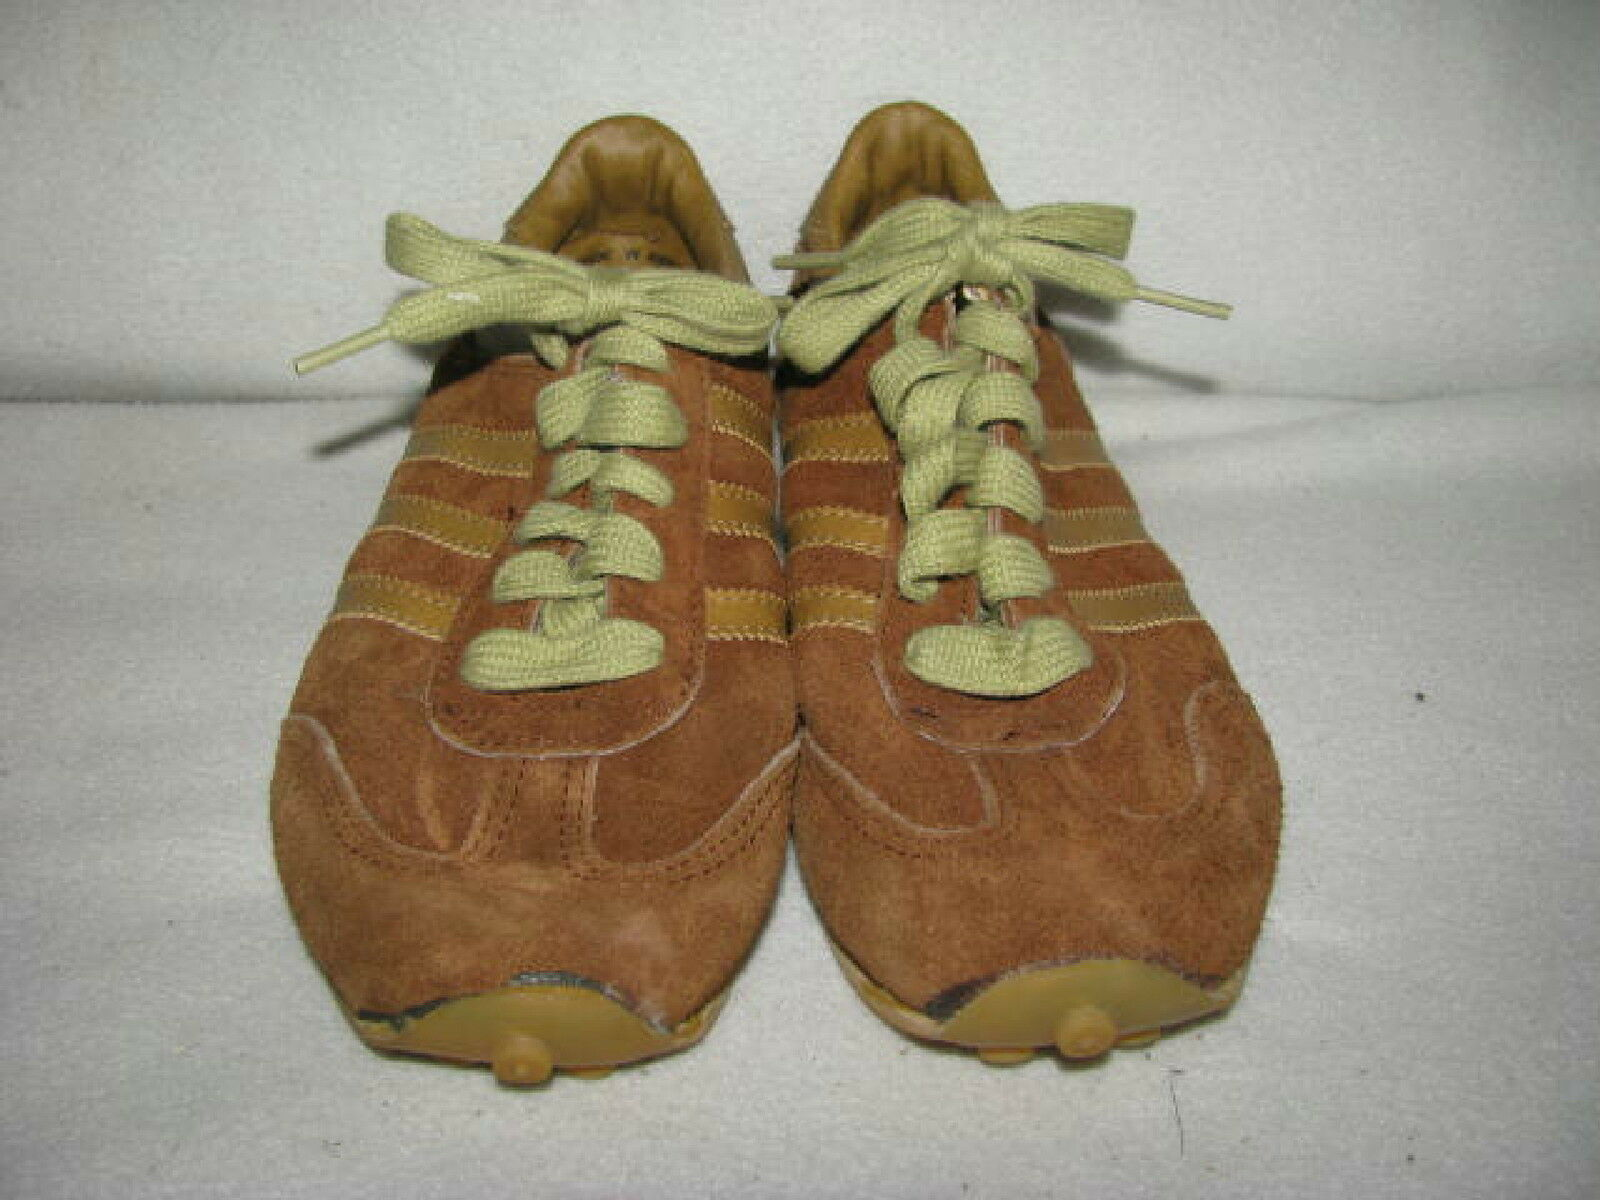 Vintage Adidas  Uomo Sz Suede 6 USA Olympics Braun Suede Sz Sneakers Schuhes JC Penny 705138